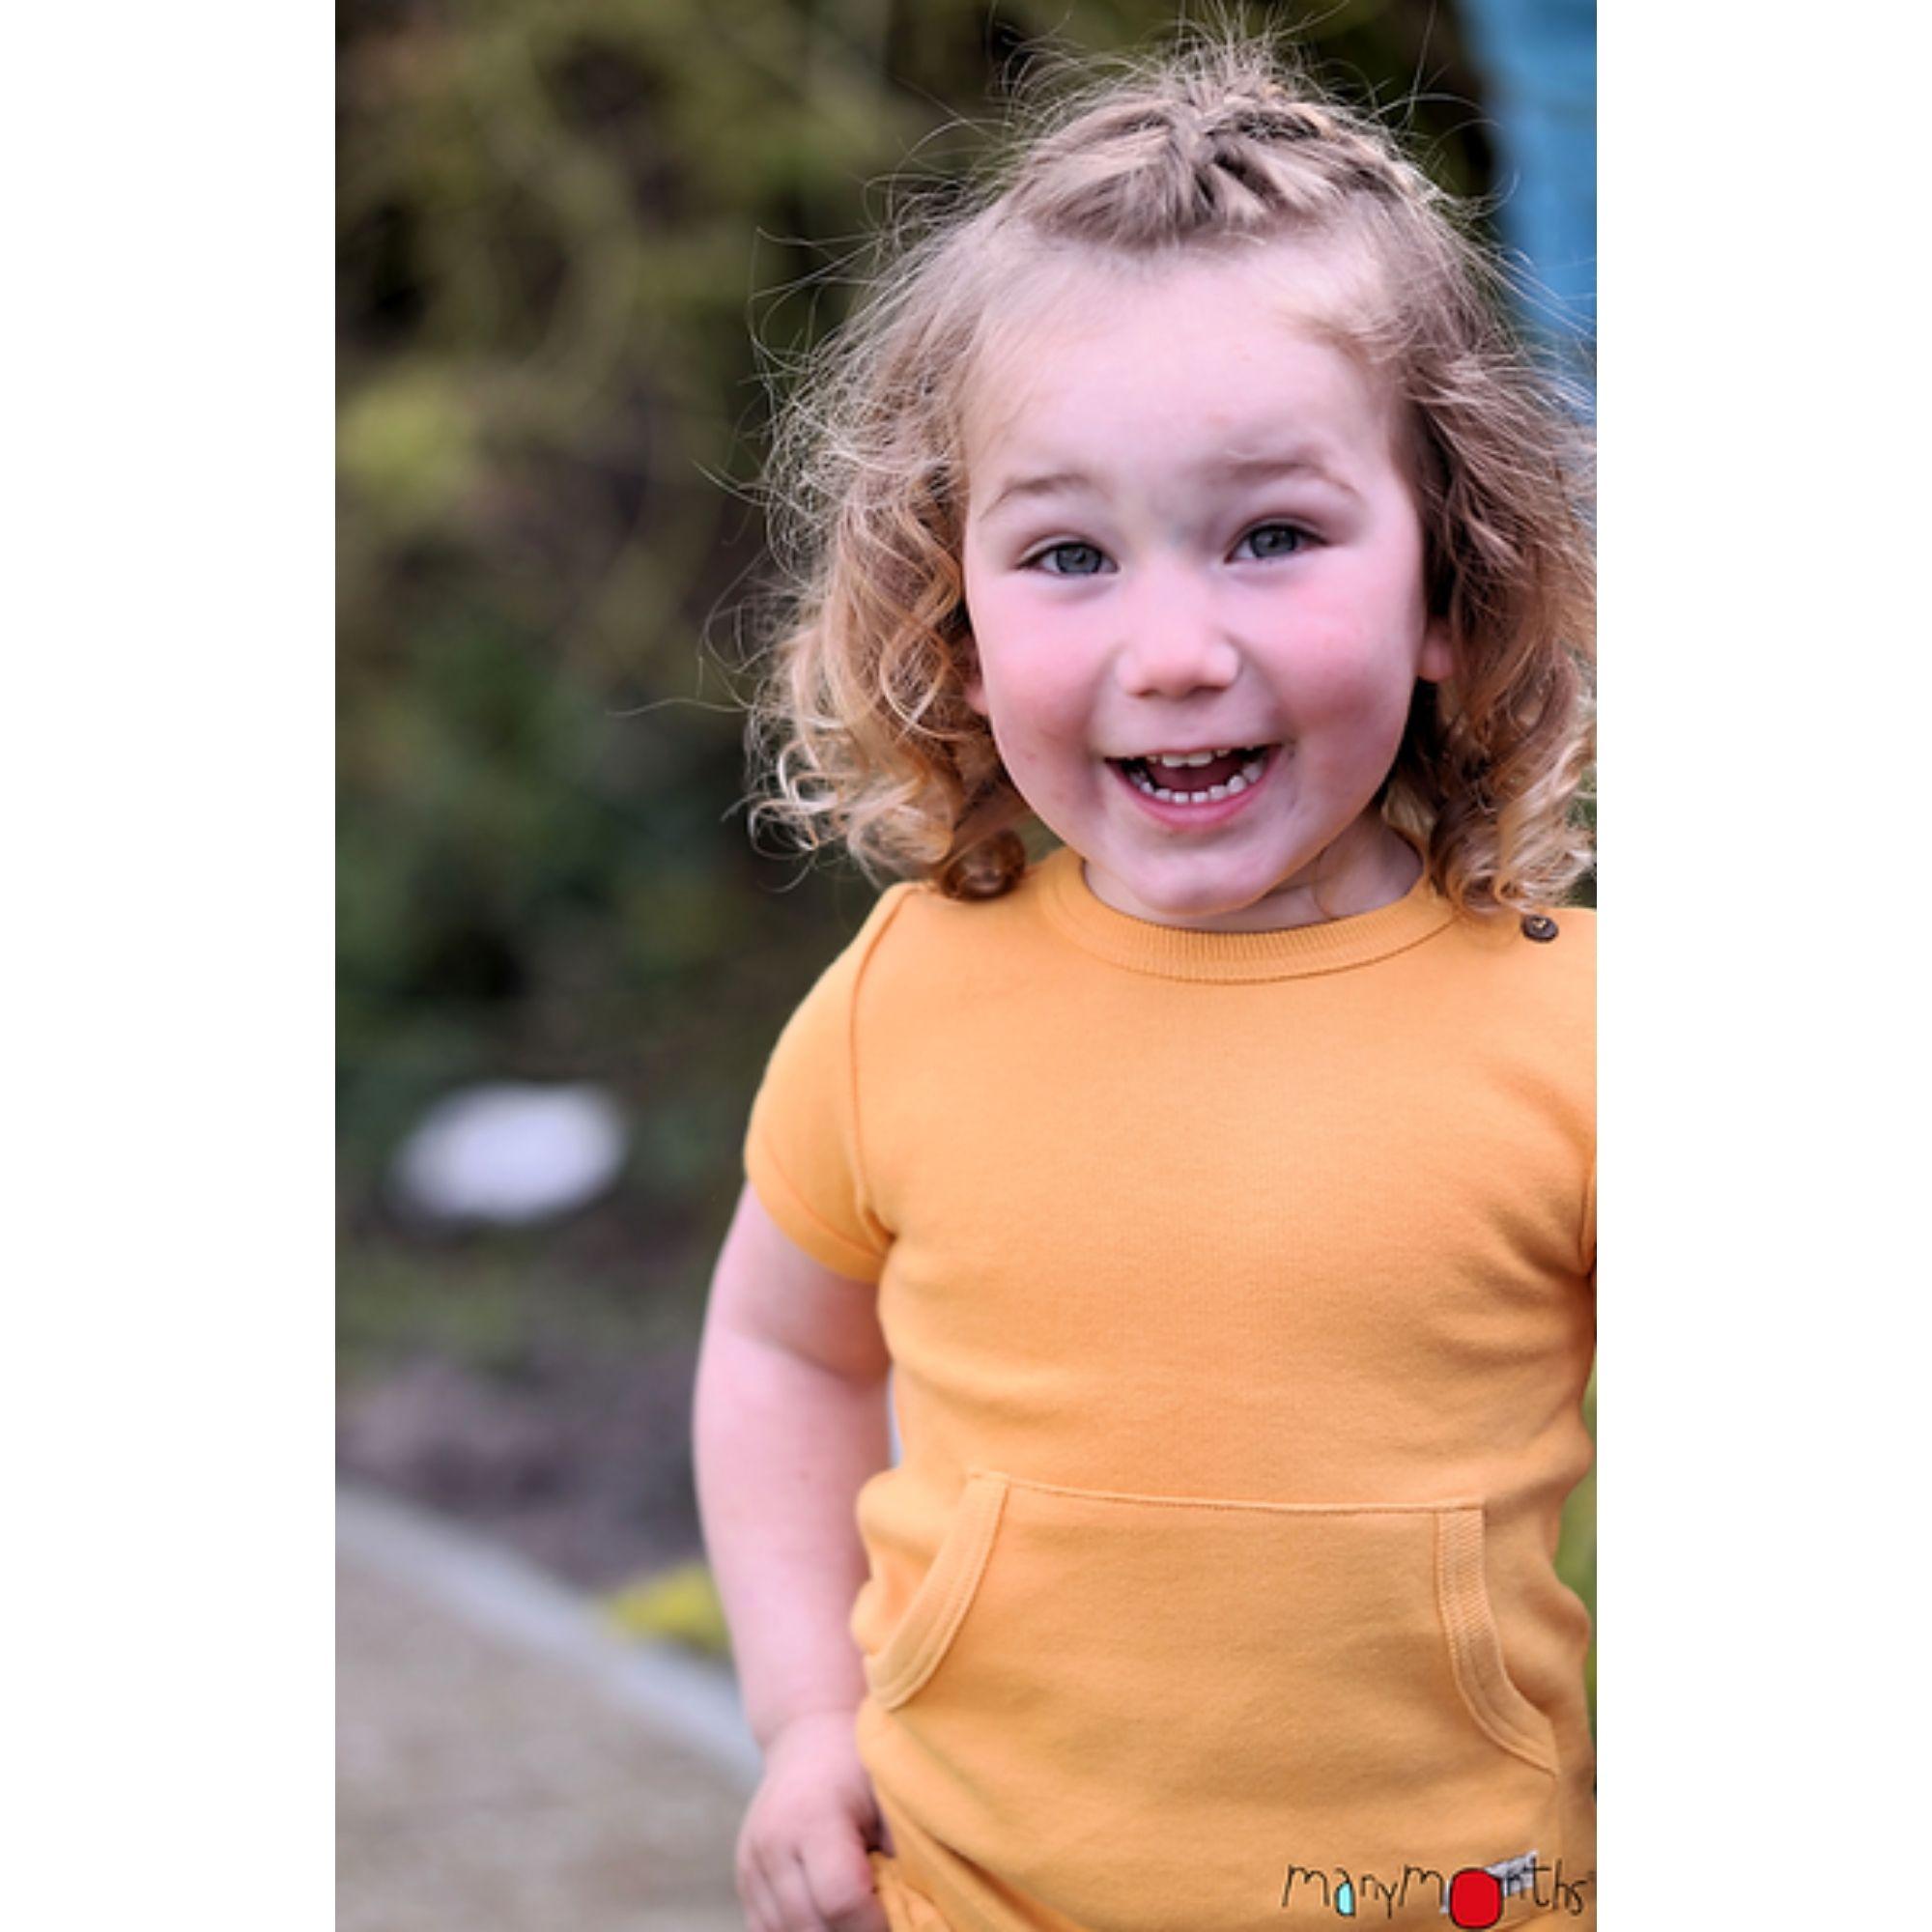 tshirt-bebe-enfant-kangaroo-ajustable-evolutif-manymonths-babyidea-coton-chanvre-maison-de-mamoulia-sans-manches-jaune